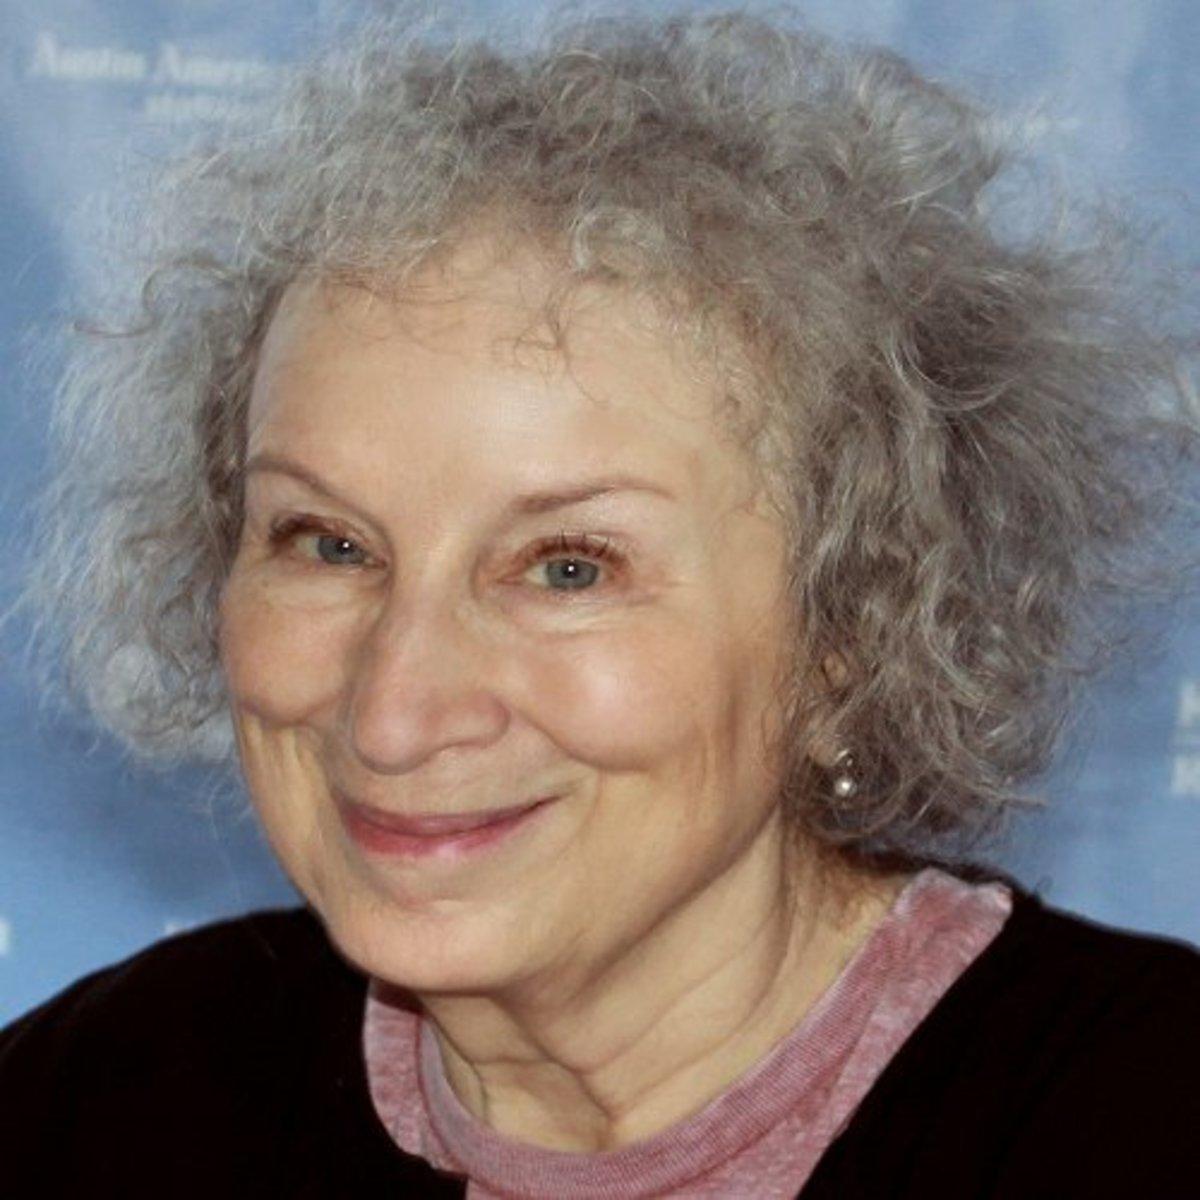 :Margaret Atwood